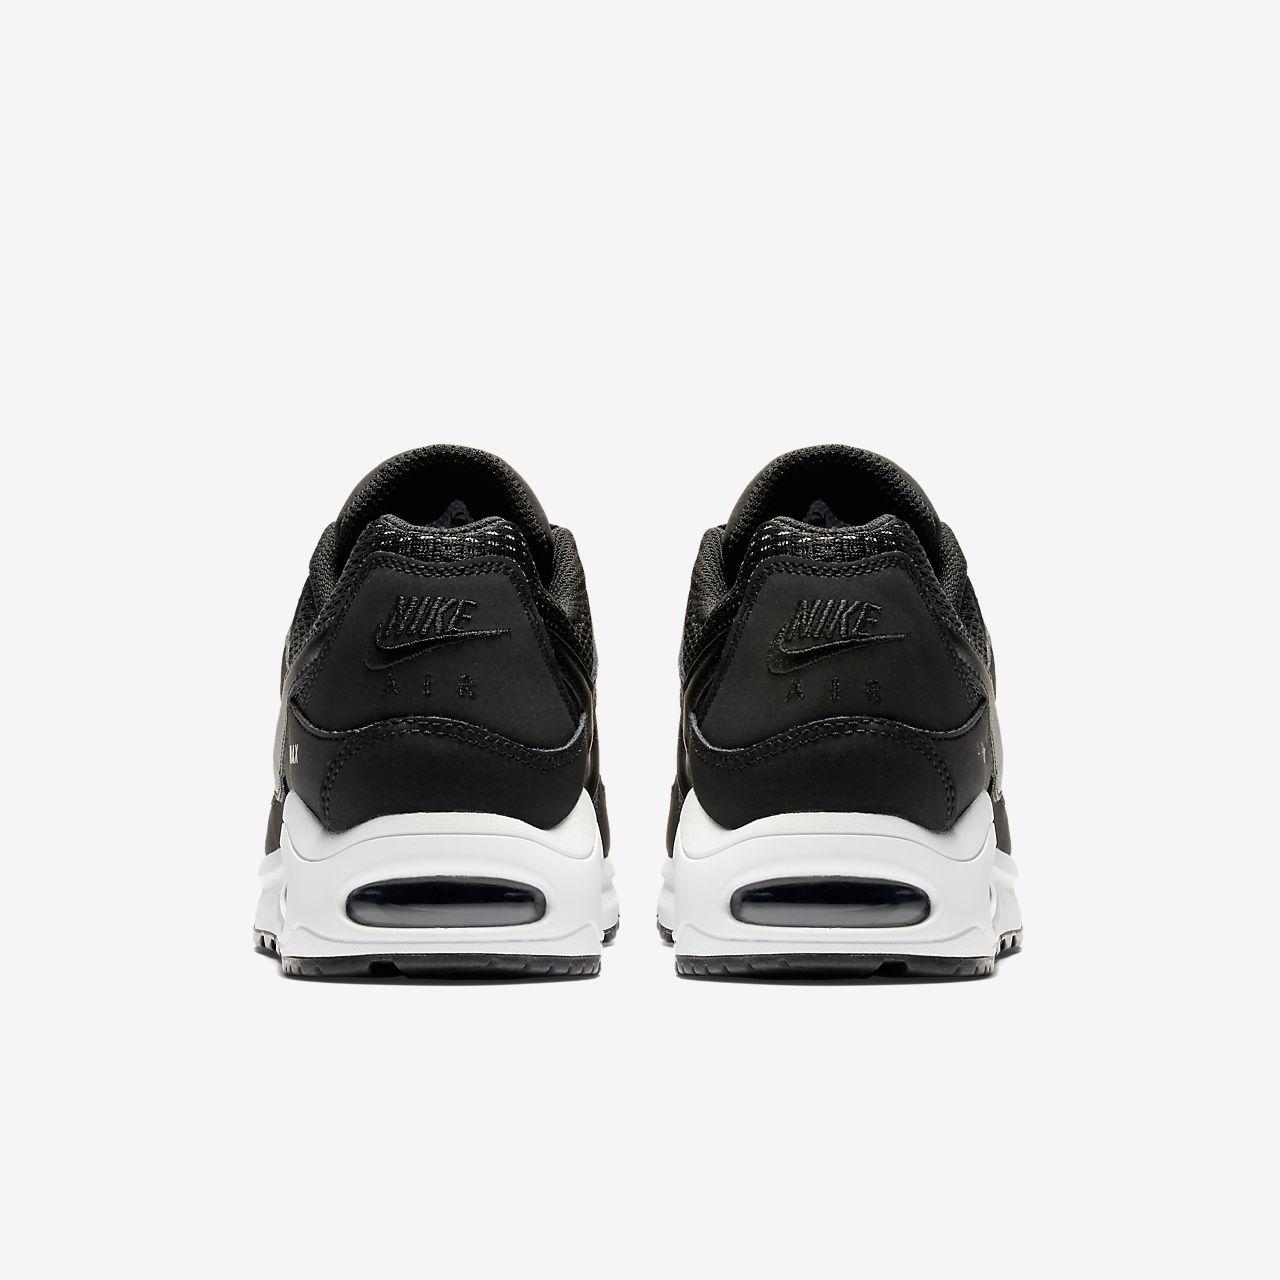 a6481c4d4ea4 Nike Air Max Command Women s Shoe. Nike.com ZA